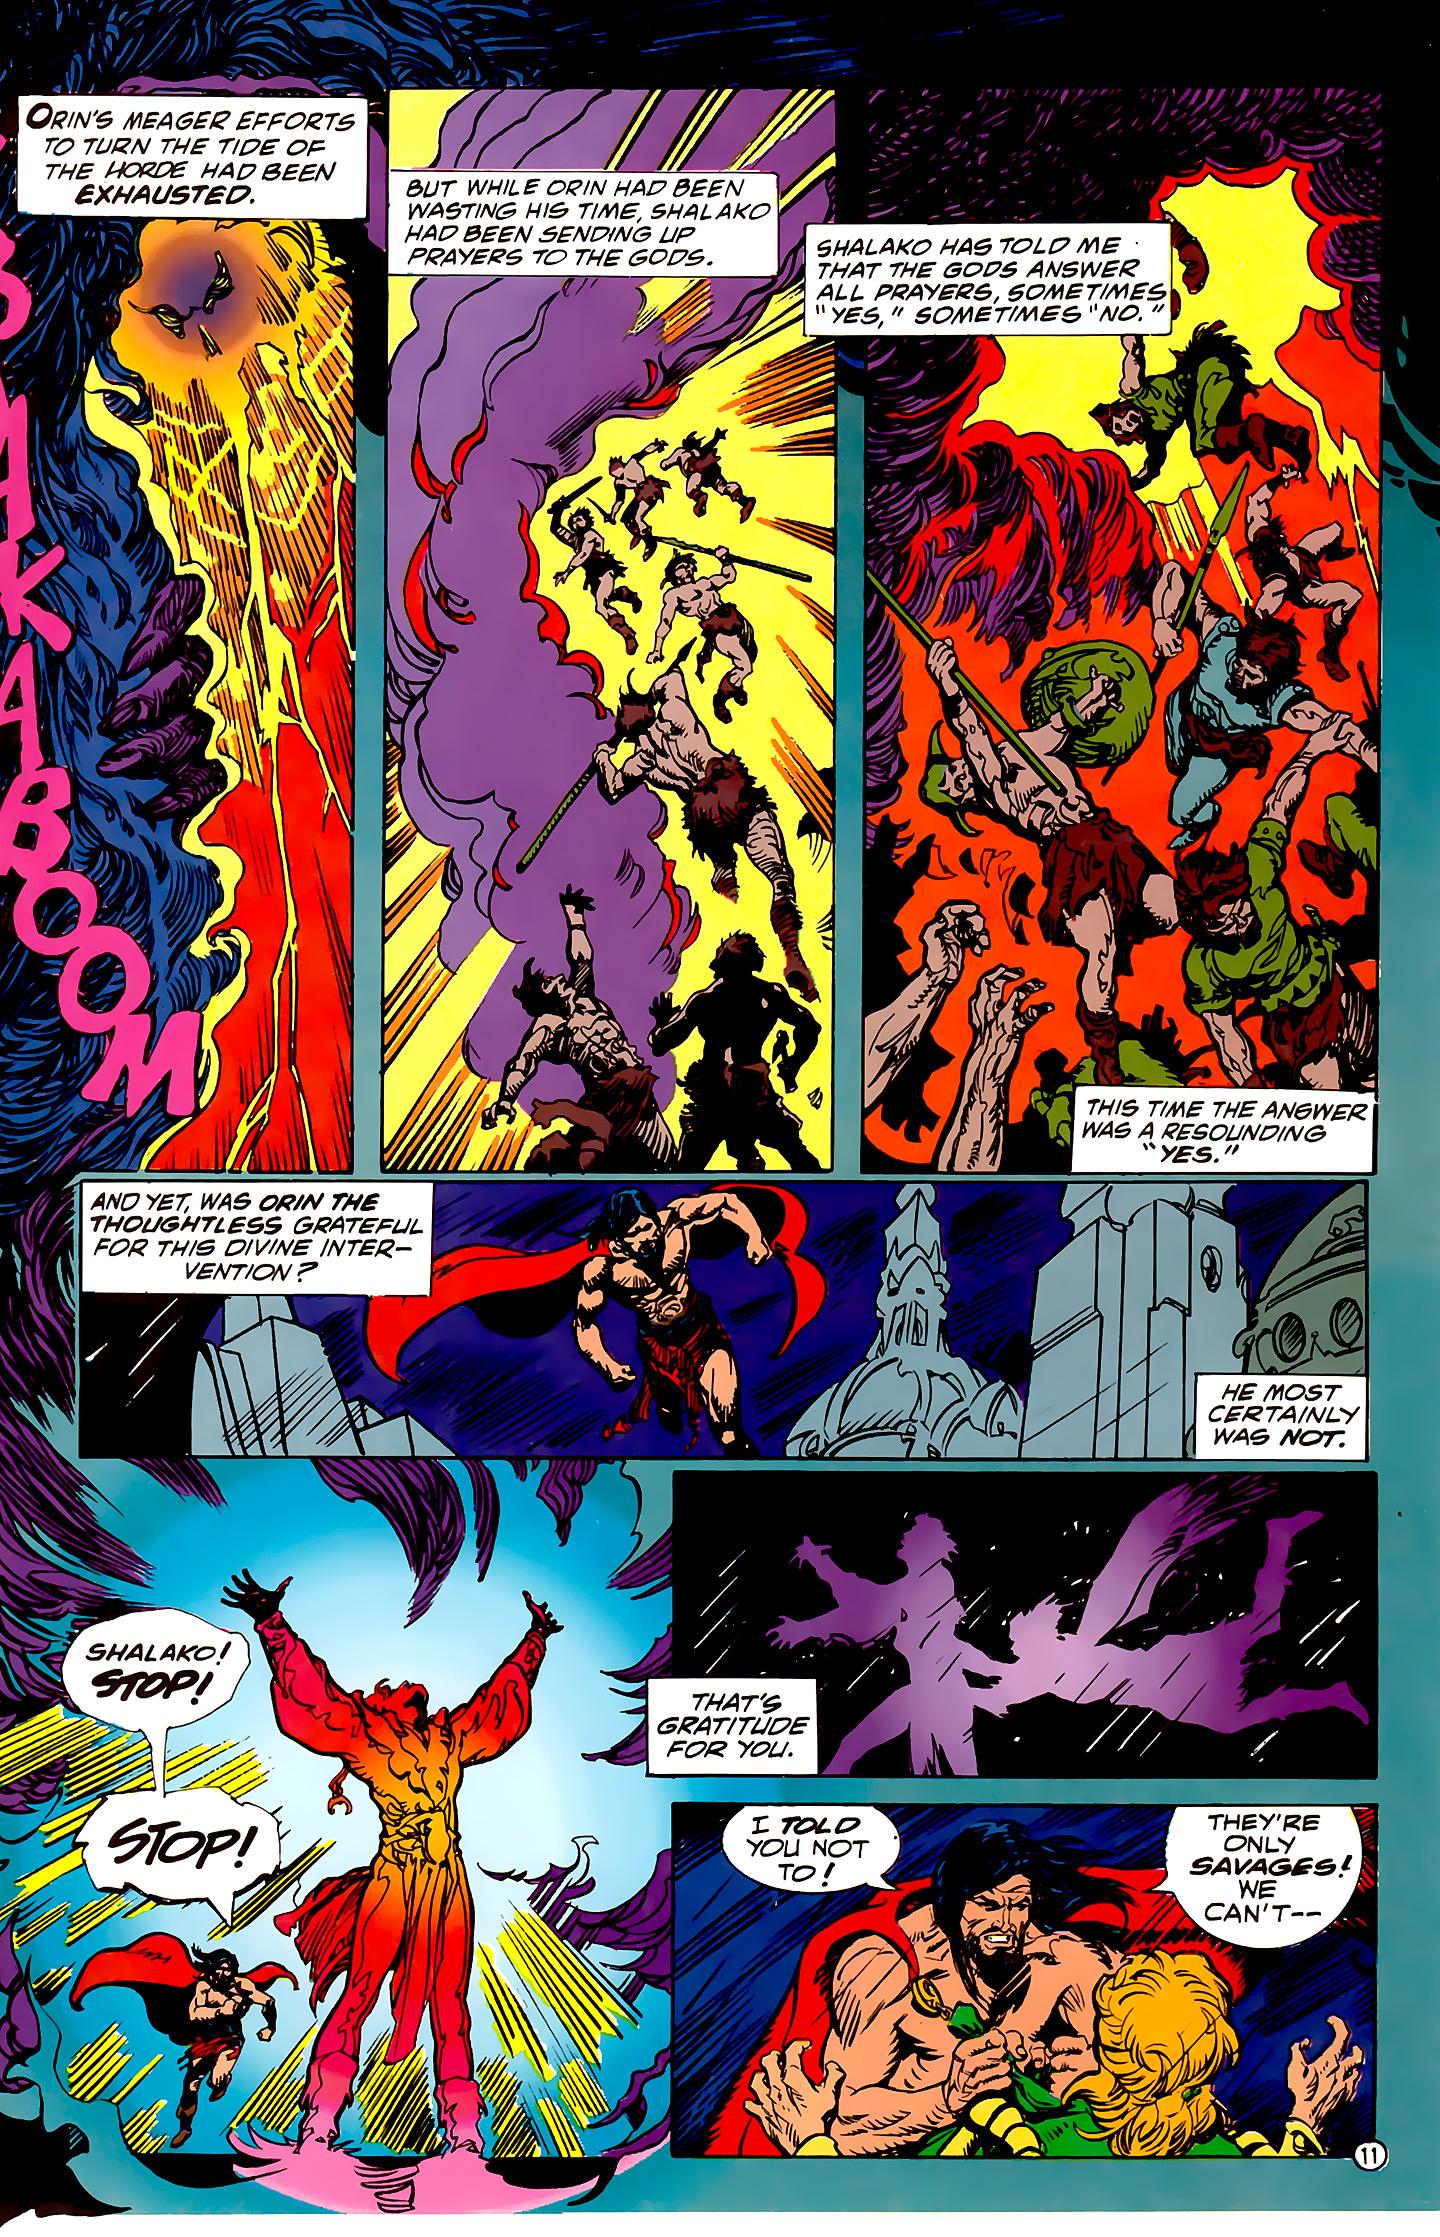 Read online Atlantis Chronicles comic -  Issue #1 - 11